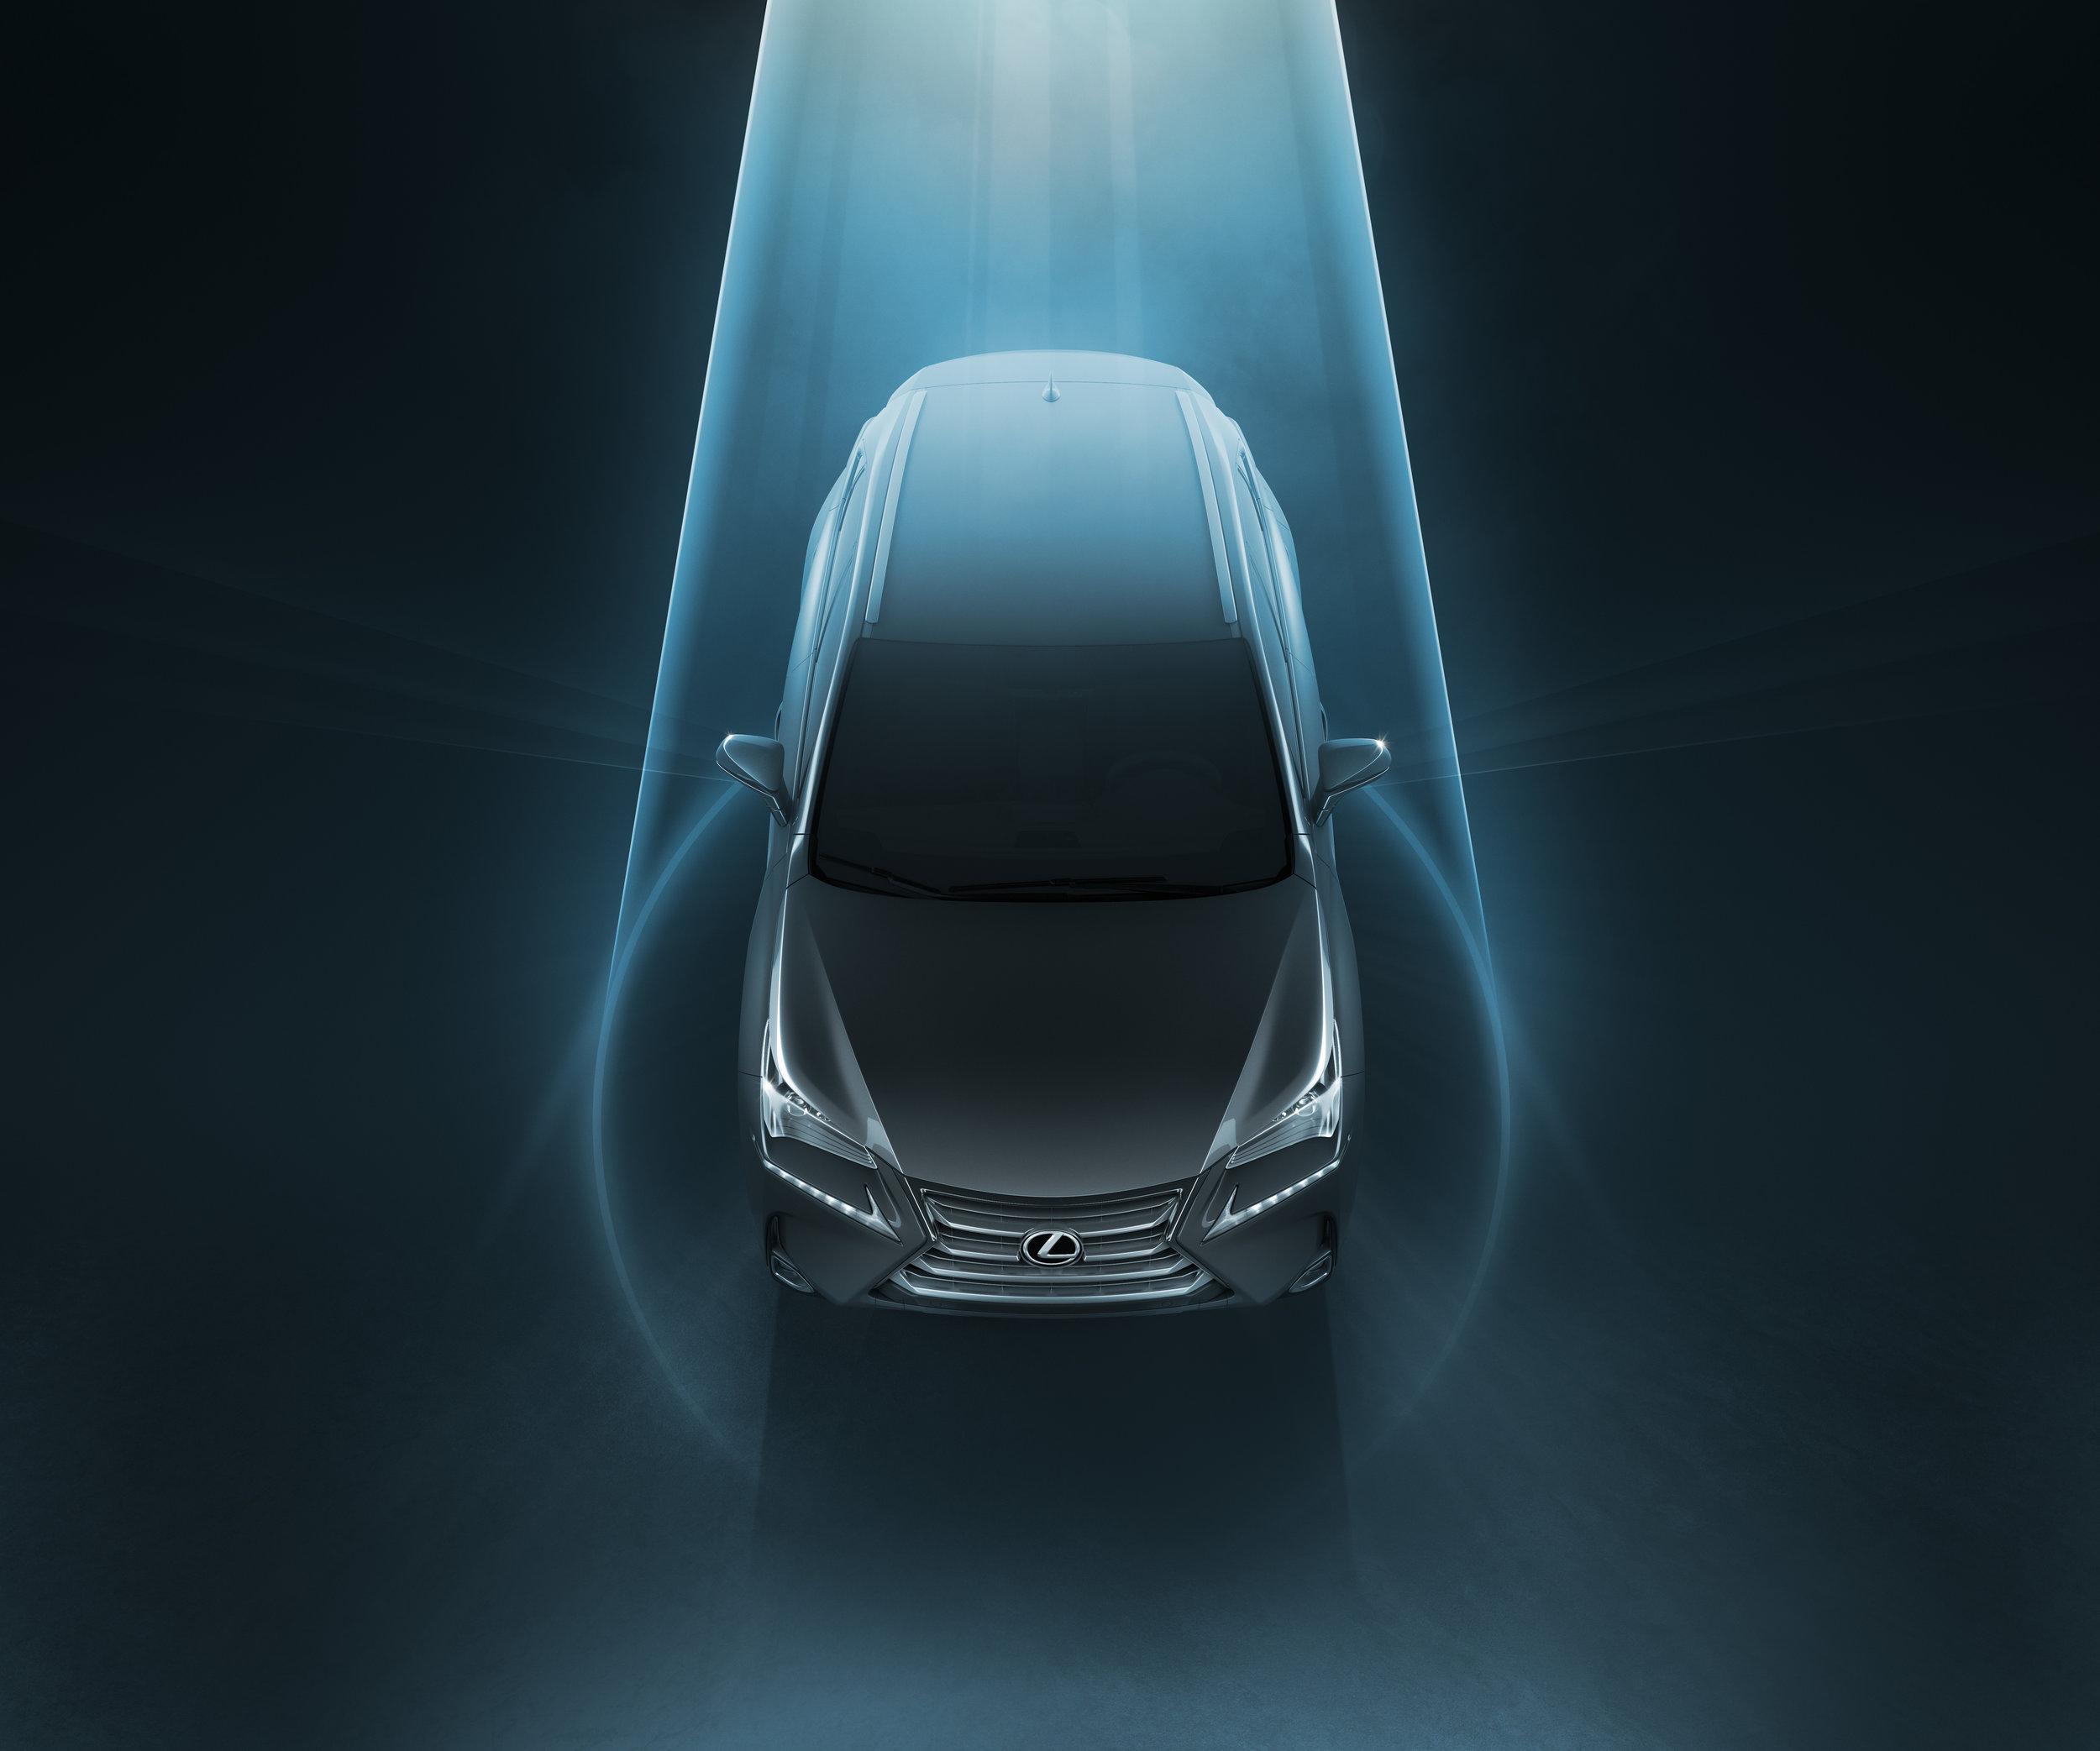 Teamone_Lexus_LASER_M_OPTION1-w5-blue.jpg